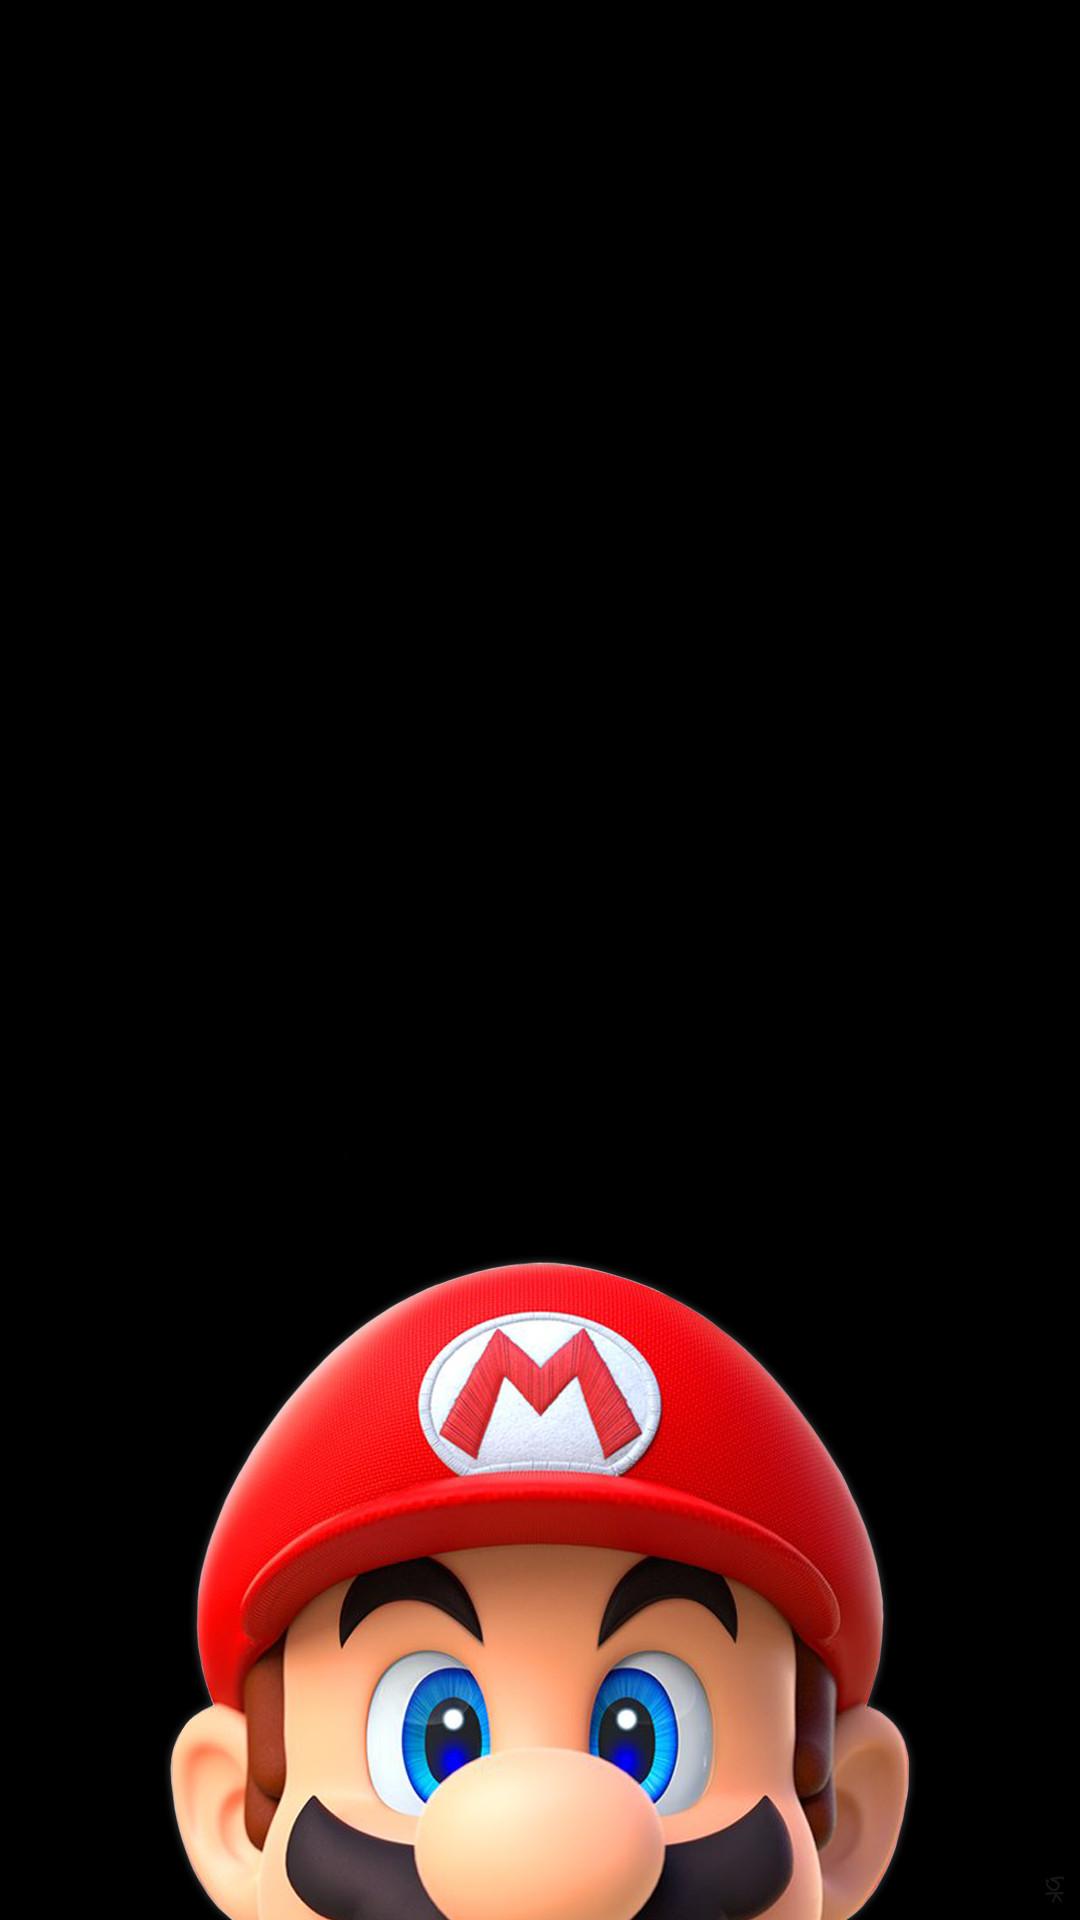 2048x2048 Cool Mario Wallpapers in High Quality, Mahin Ferentz. 2048x2048 0.528 MB. Mario Wallpaper